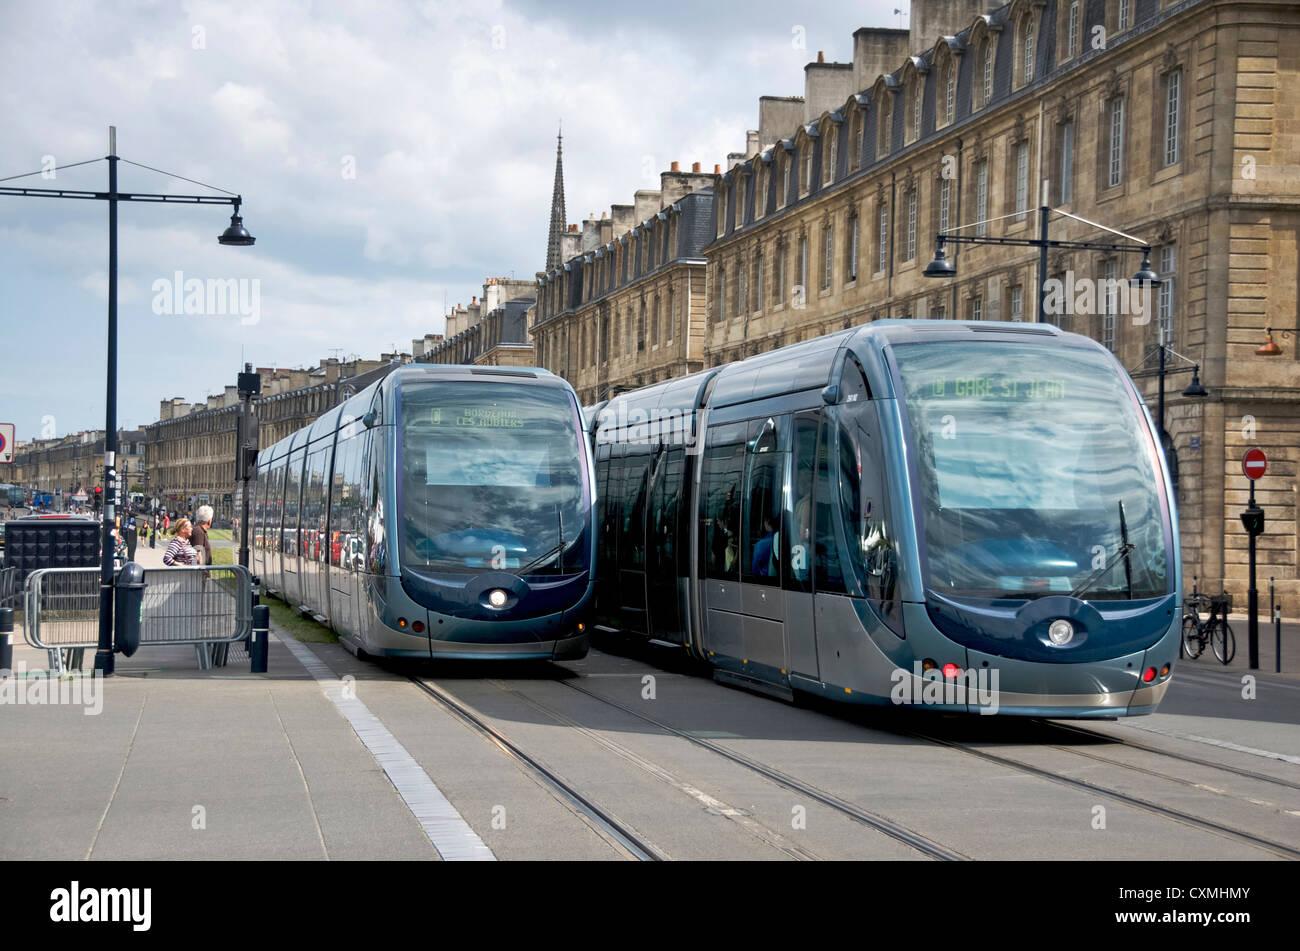 Public transport tram system in old Bordeaux, France, Europe - Stock Image